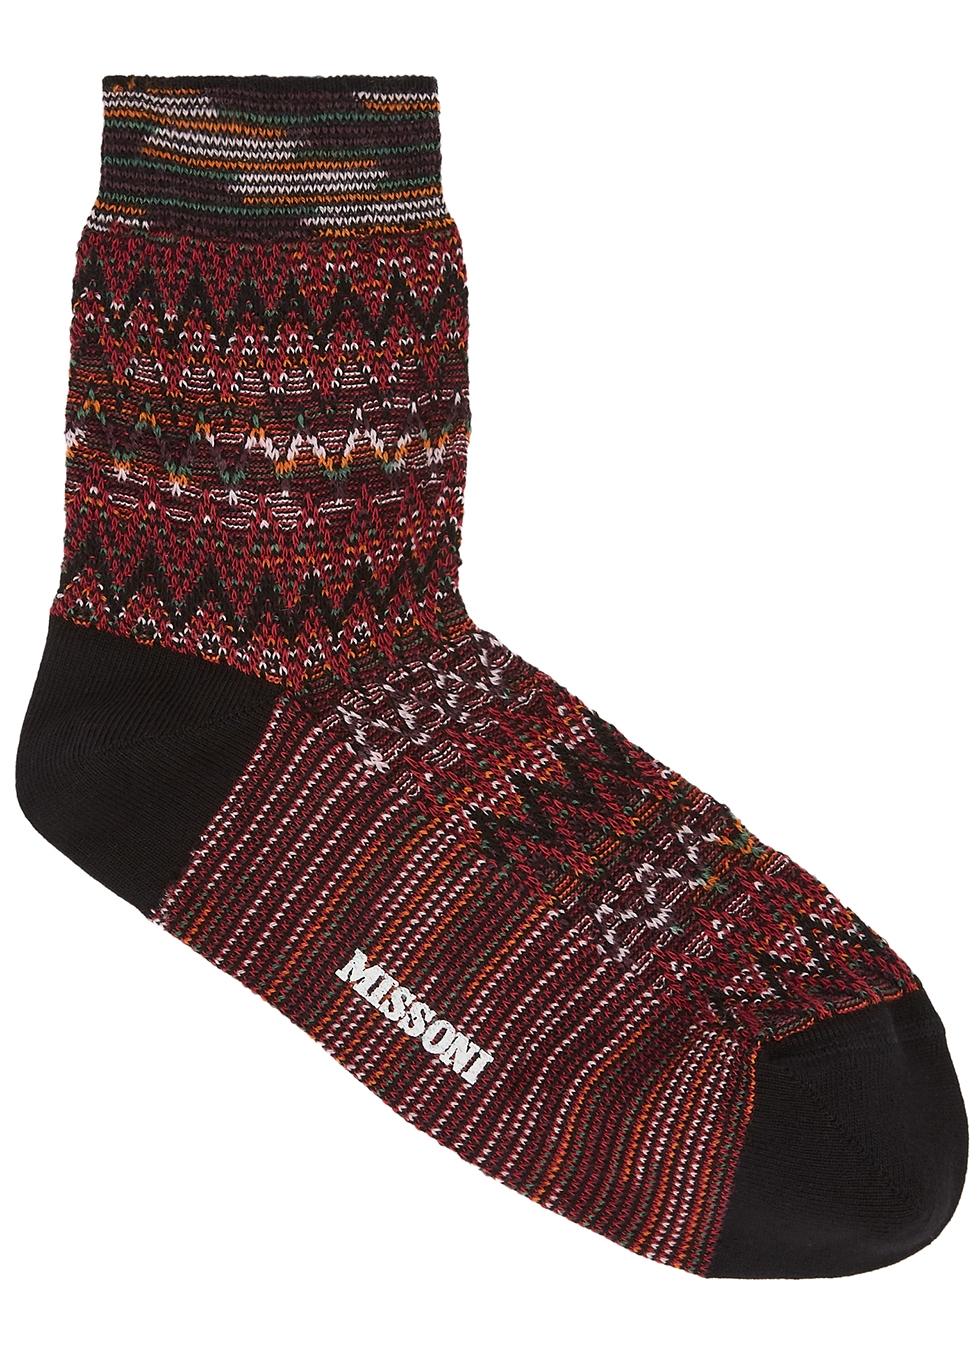 Zigzag cotton-blend socks